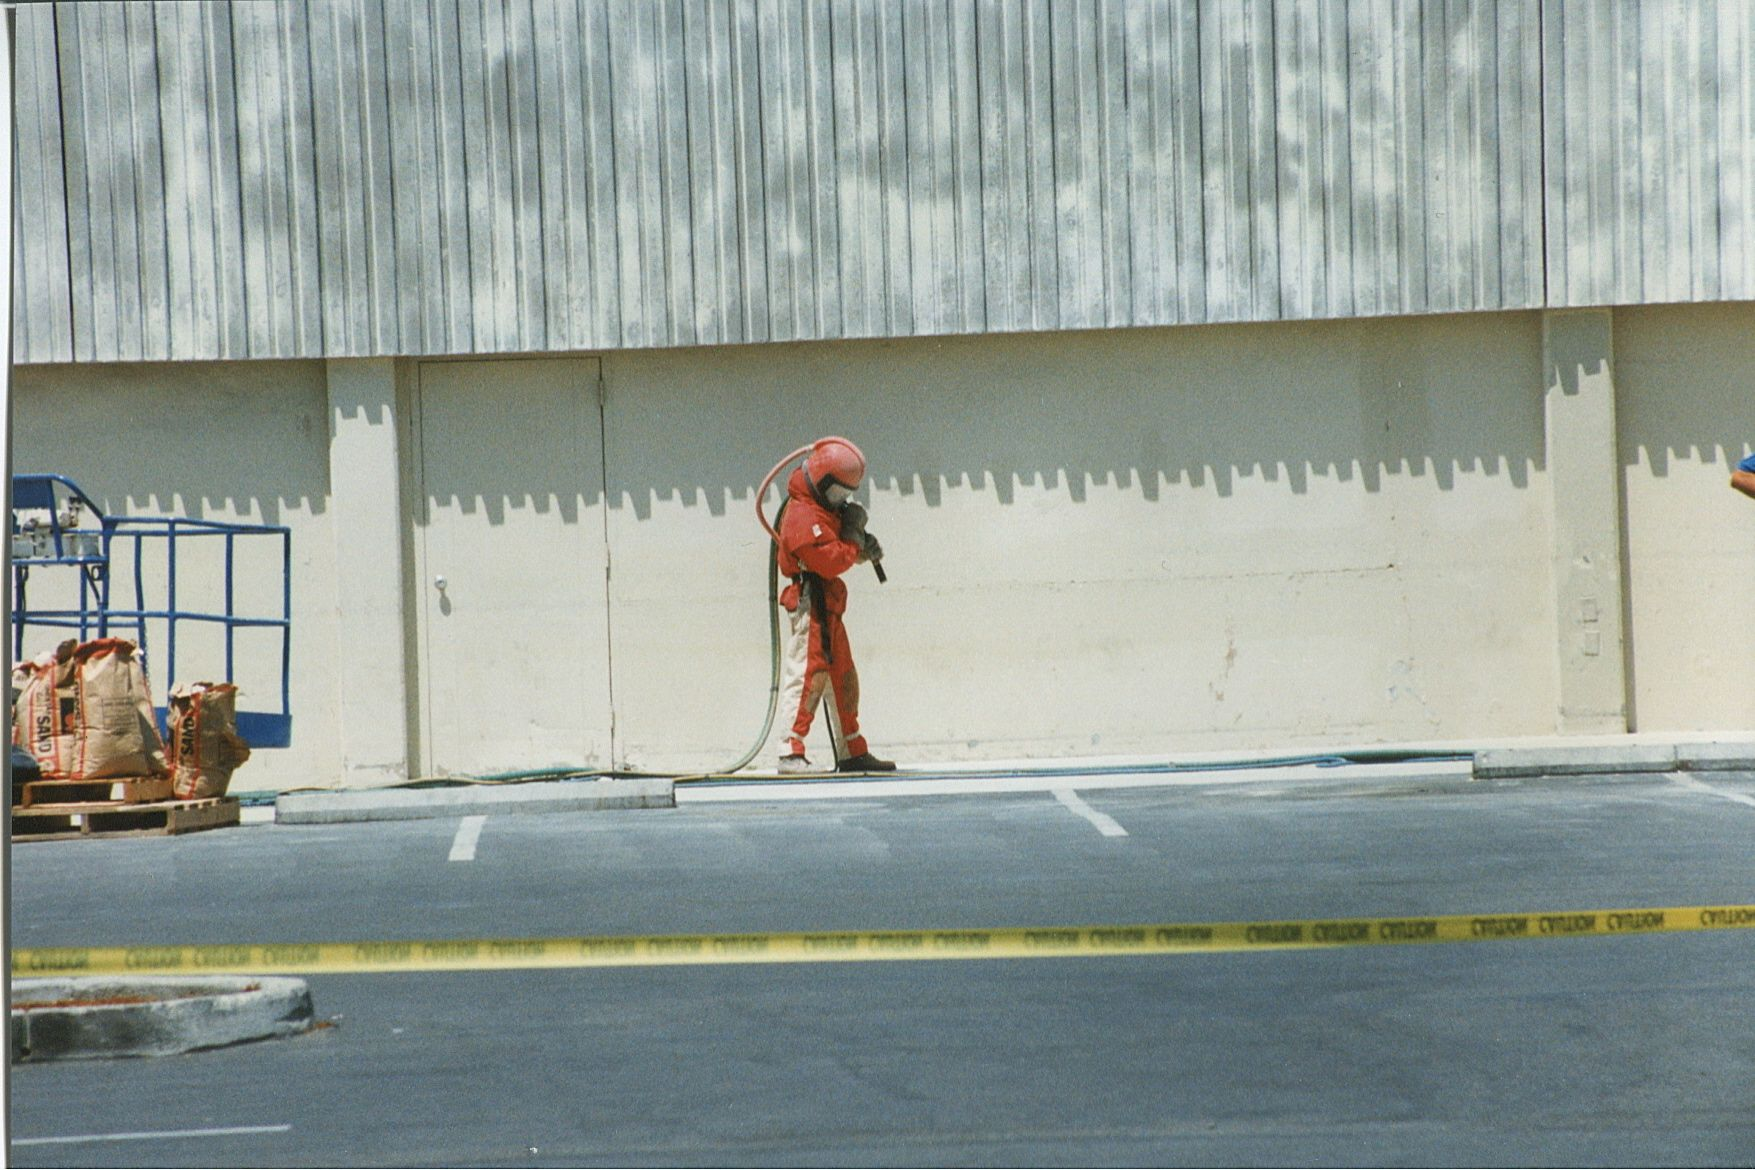 A South Bay Sandblasting - San Jose, CA